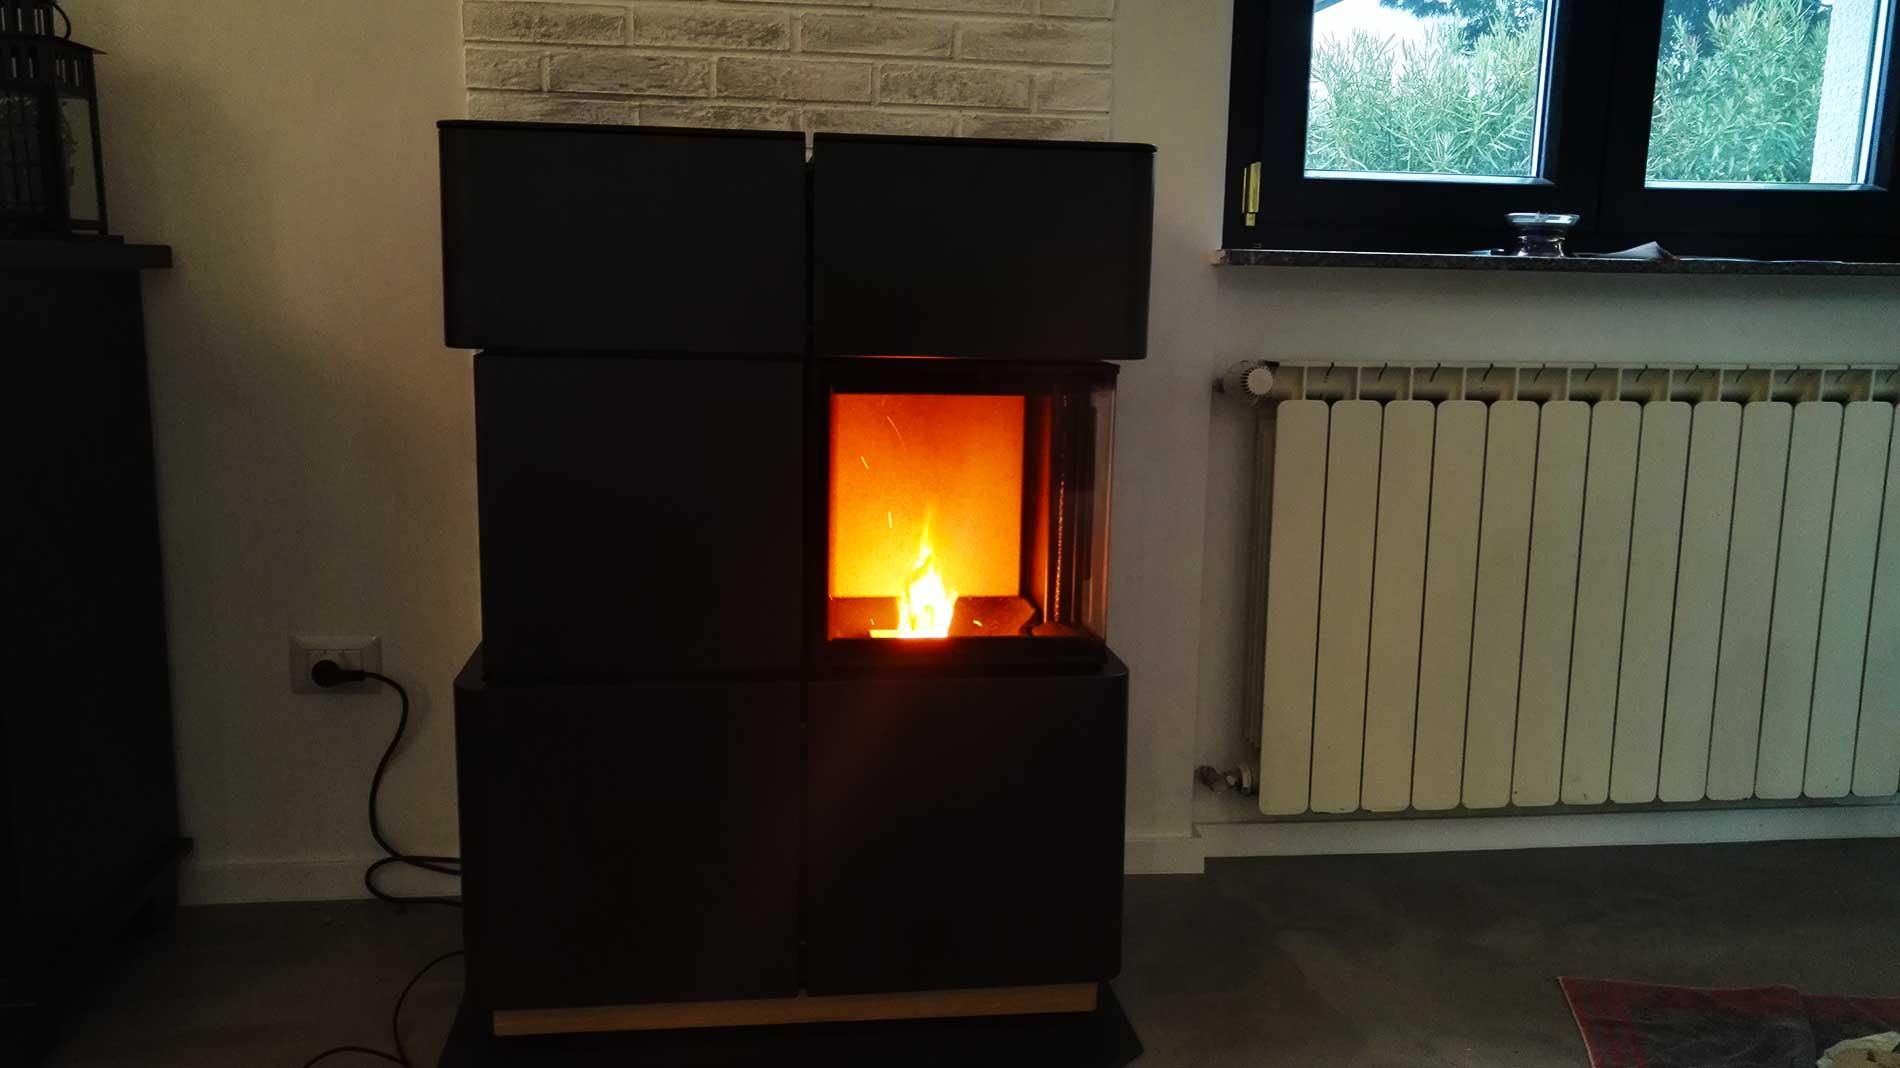 Installazione canna fumaria stufa a pellet ravelli - Stufa a metano con canna fumaria ...